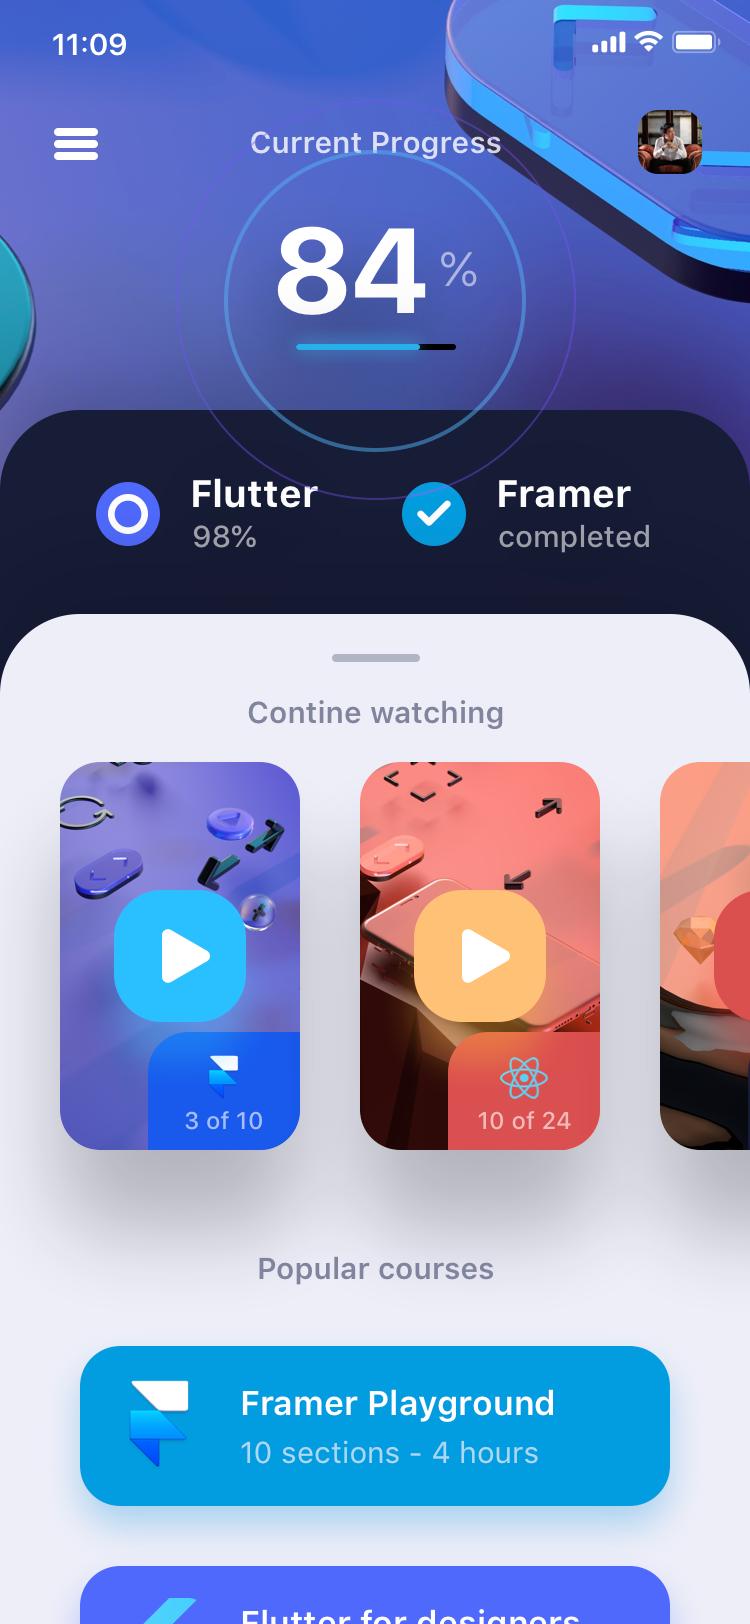 Framer Playground Course by Design+Code